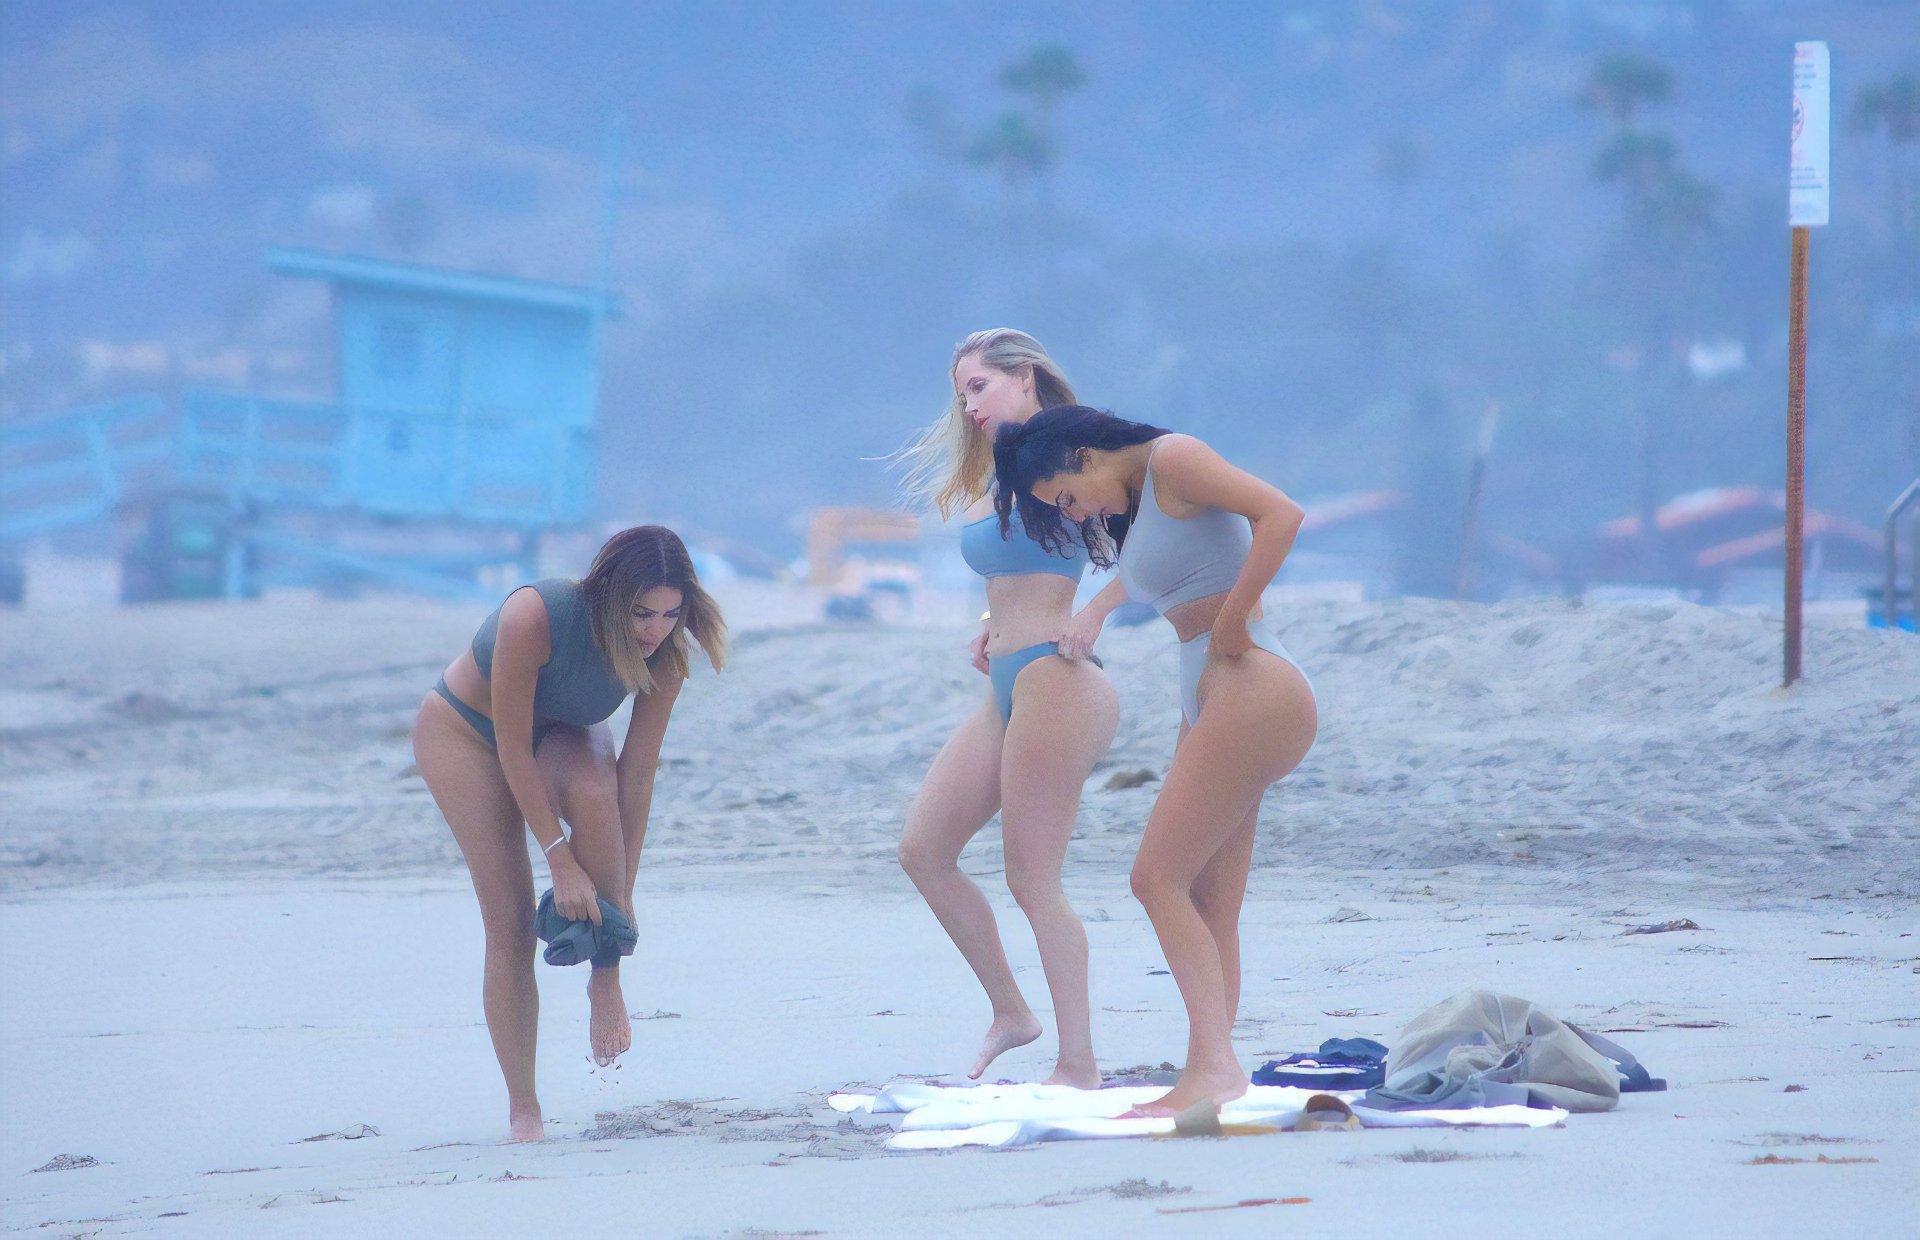 Kim-Kardashian-Sexy-TheFappeningBlog.com-14.jpg